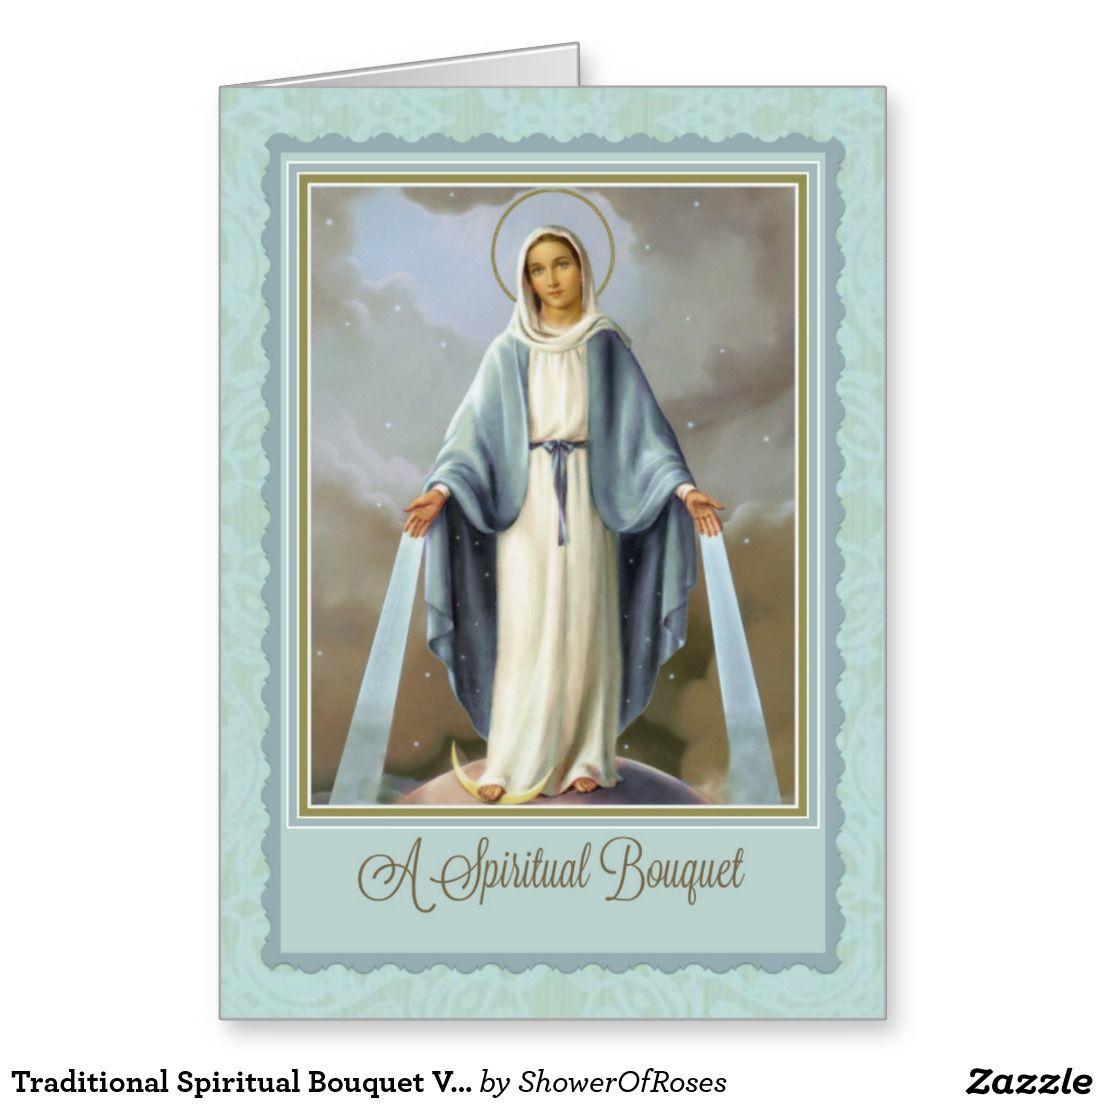 Traditional Spiritual Bouquet Virgin Mary Card Virgin Mary